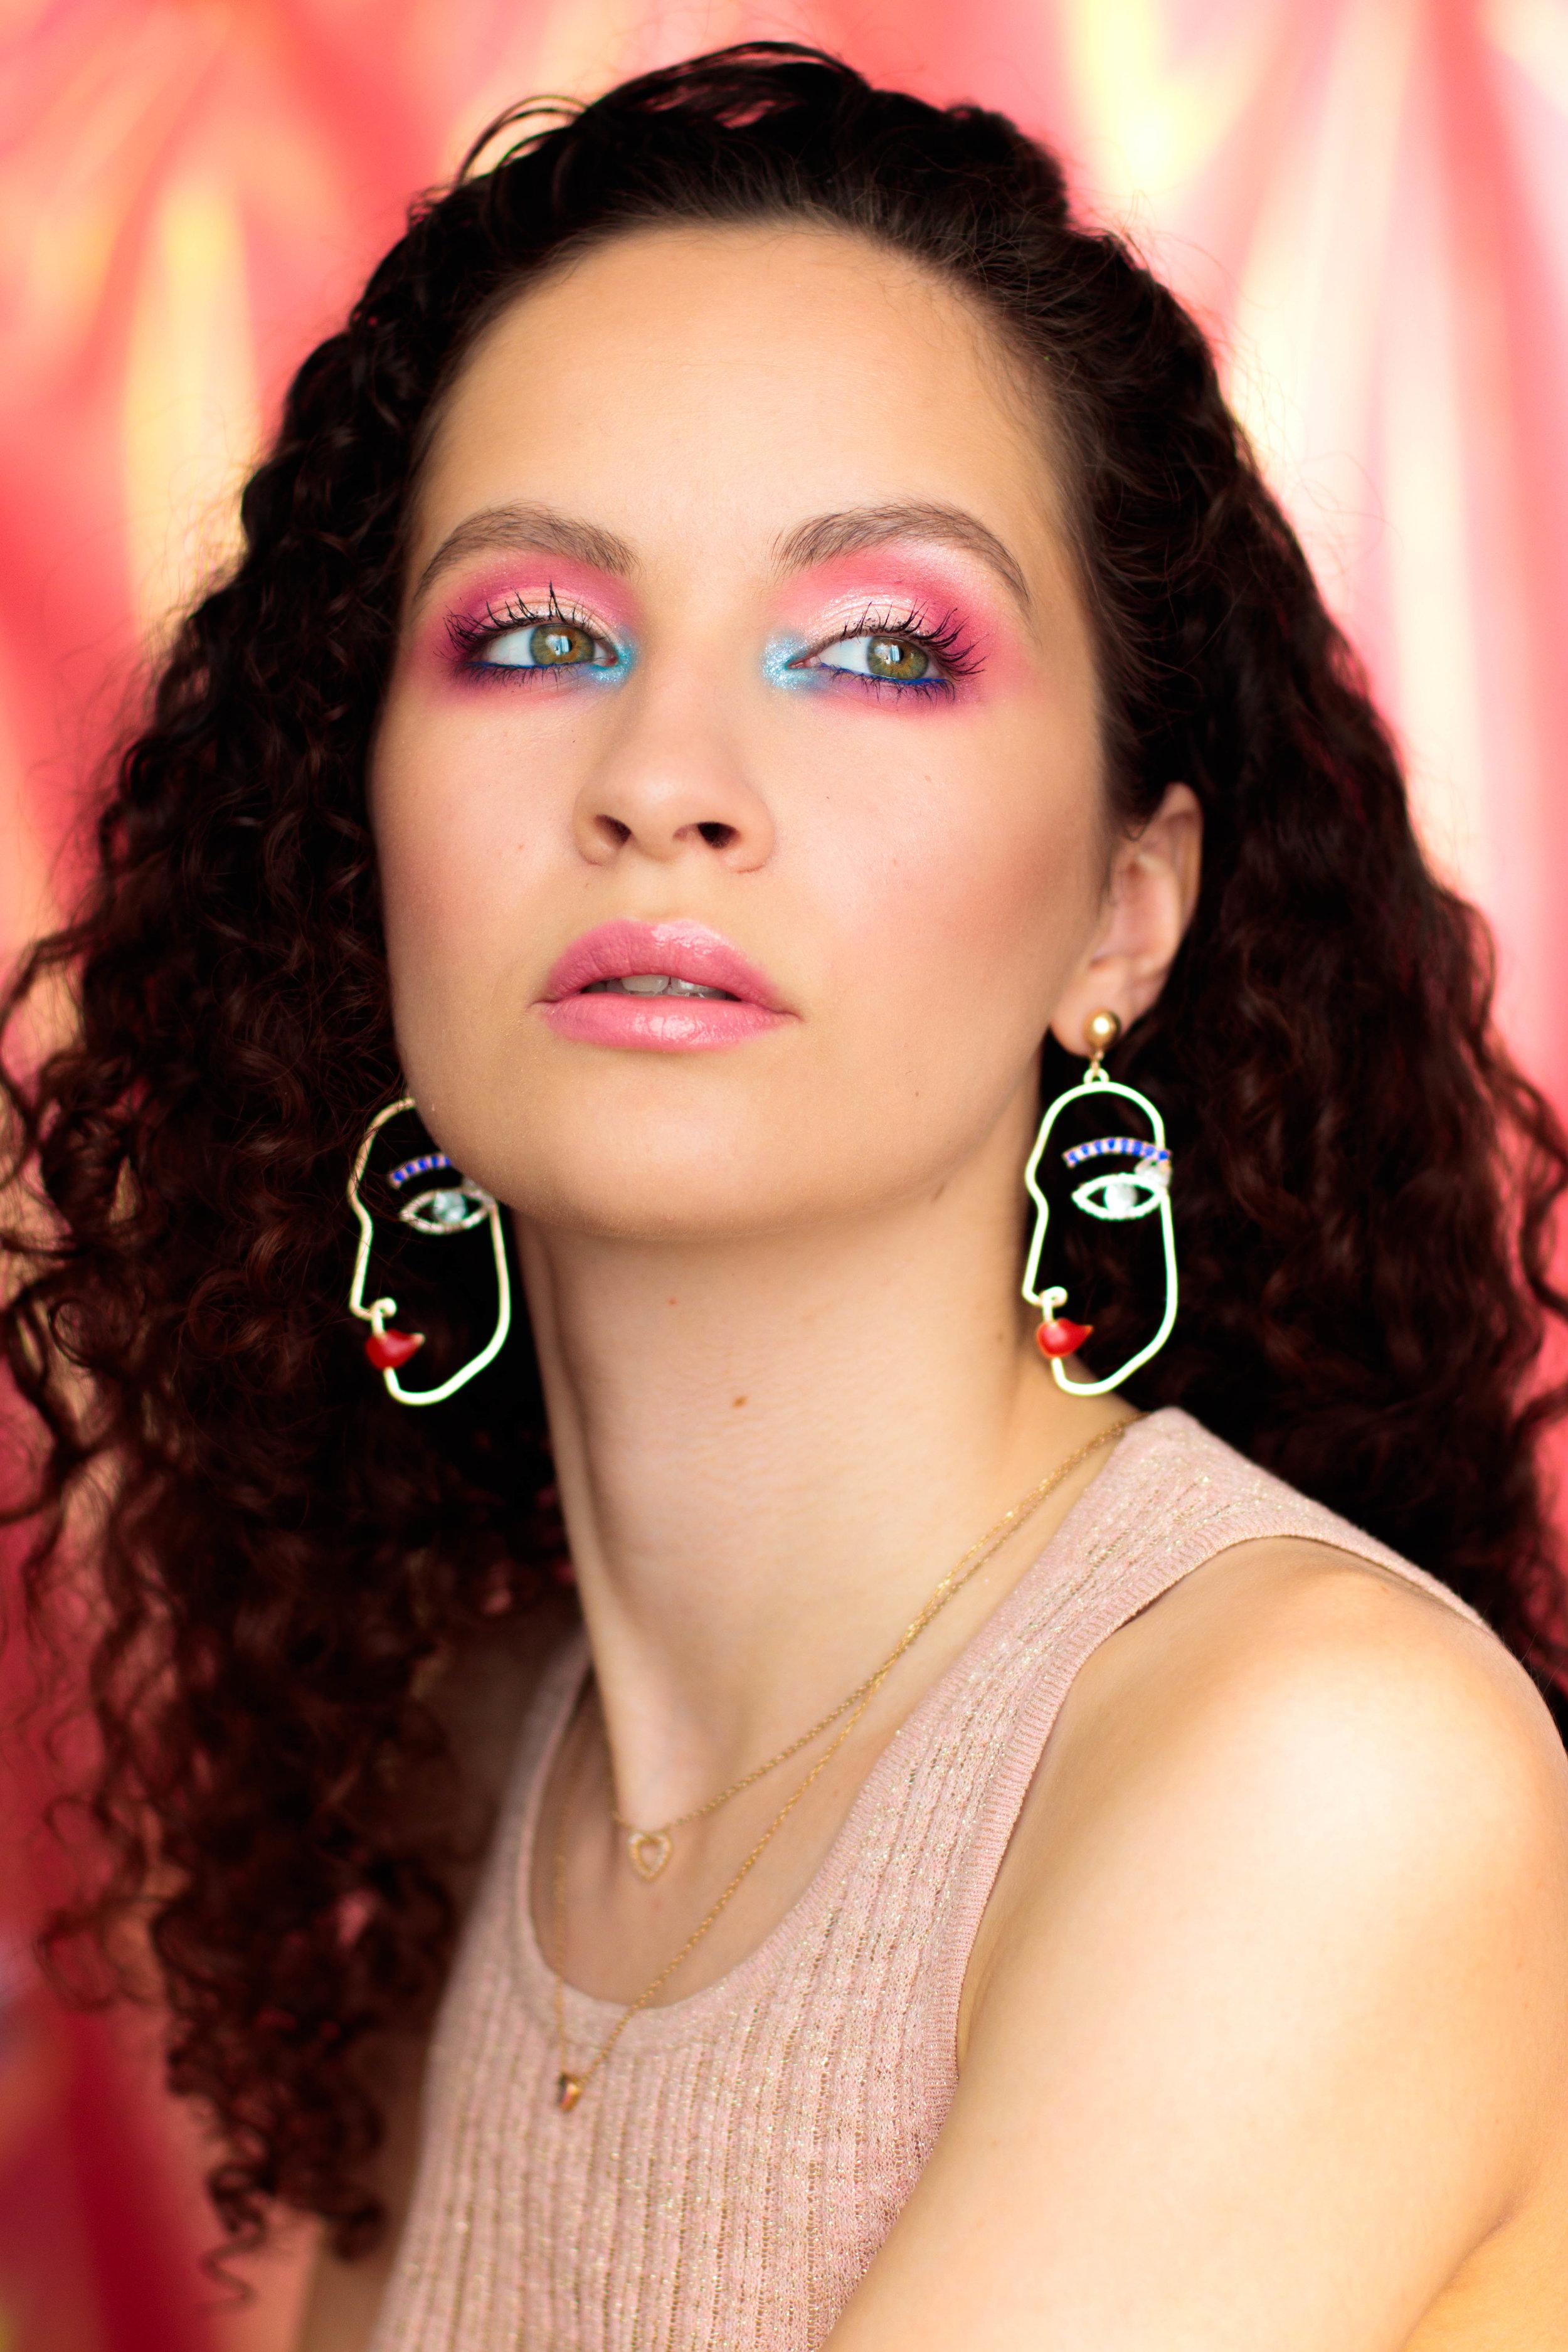 paradise-makeup-pauuulette-eyn-bright-matte-beauty-bay-3.jpg